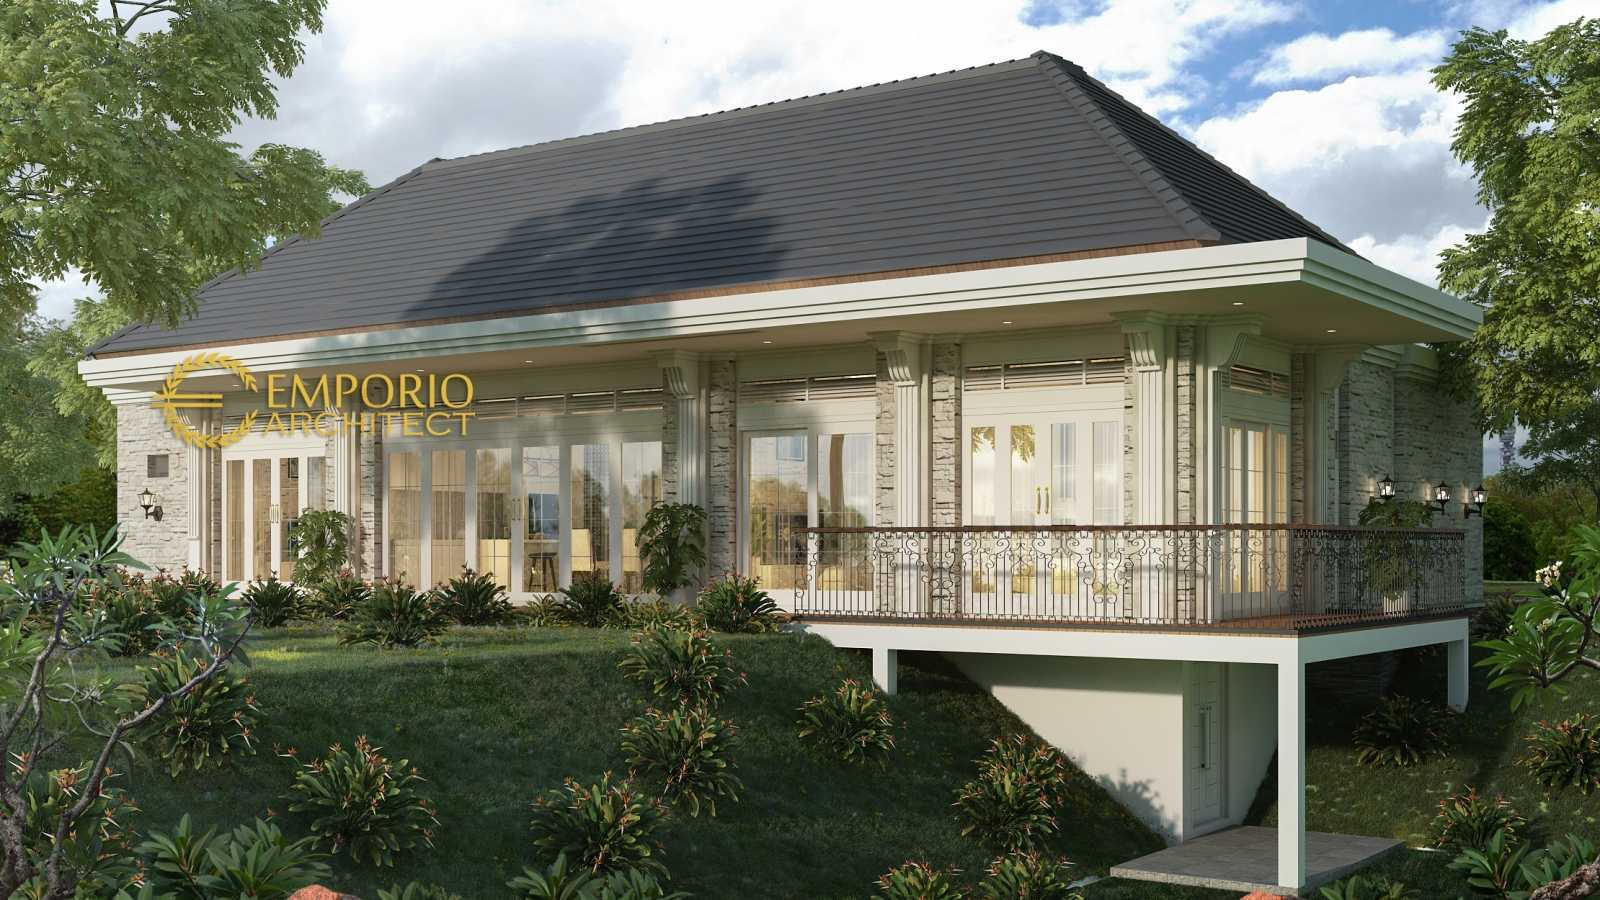 Emporio Architect Desain Rumah Villa Bali Tropis 576 @ Sumatera Barat Sumatera Barat, Indonesia Sumatera Barat, Indonesia Emporio-Architect-Desain-Rumah-Villa-Bali-Tropis-576-Sumatera-Barat   74405